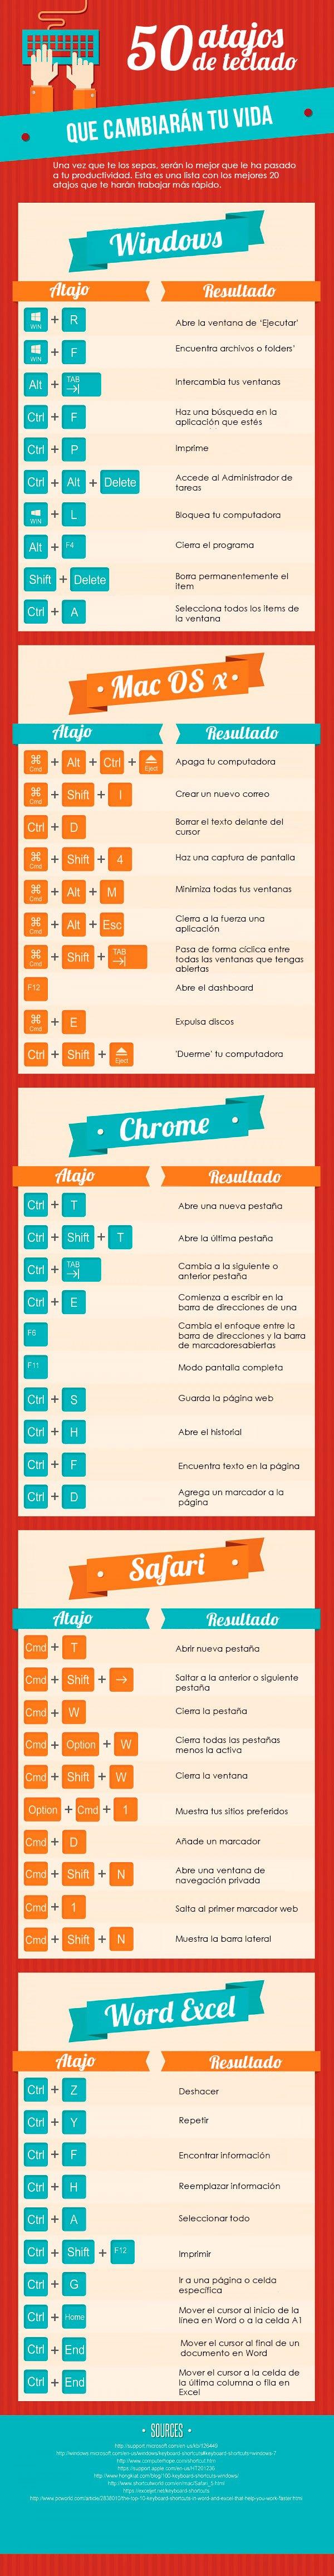 50 atajos de teclado que debes conocer #infografia #infographic